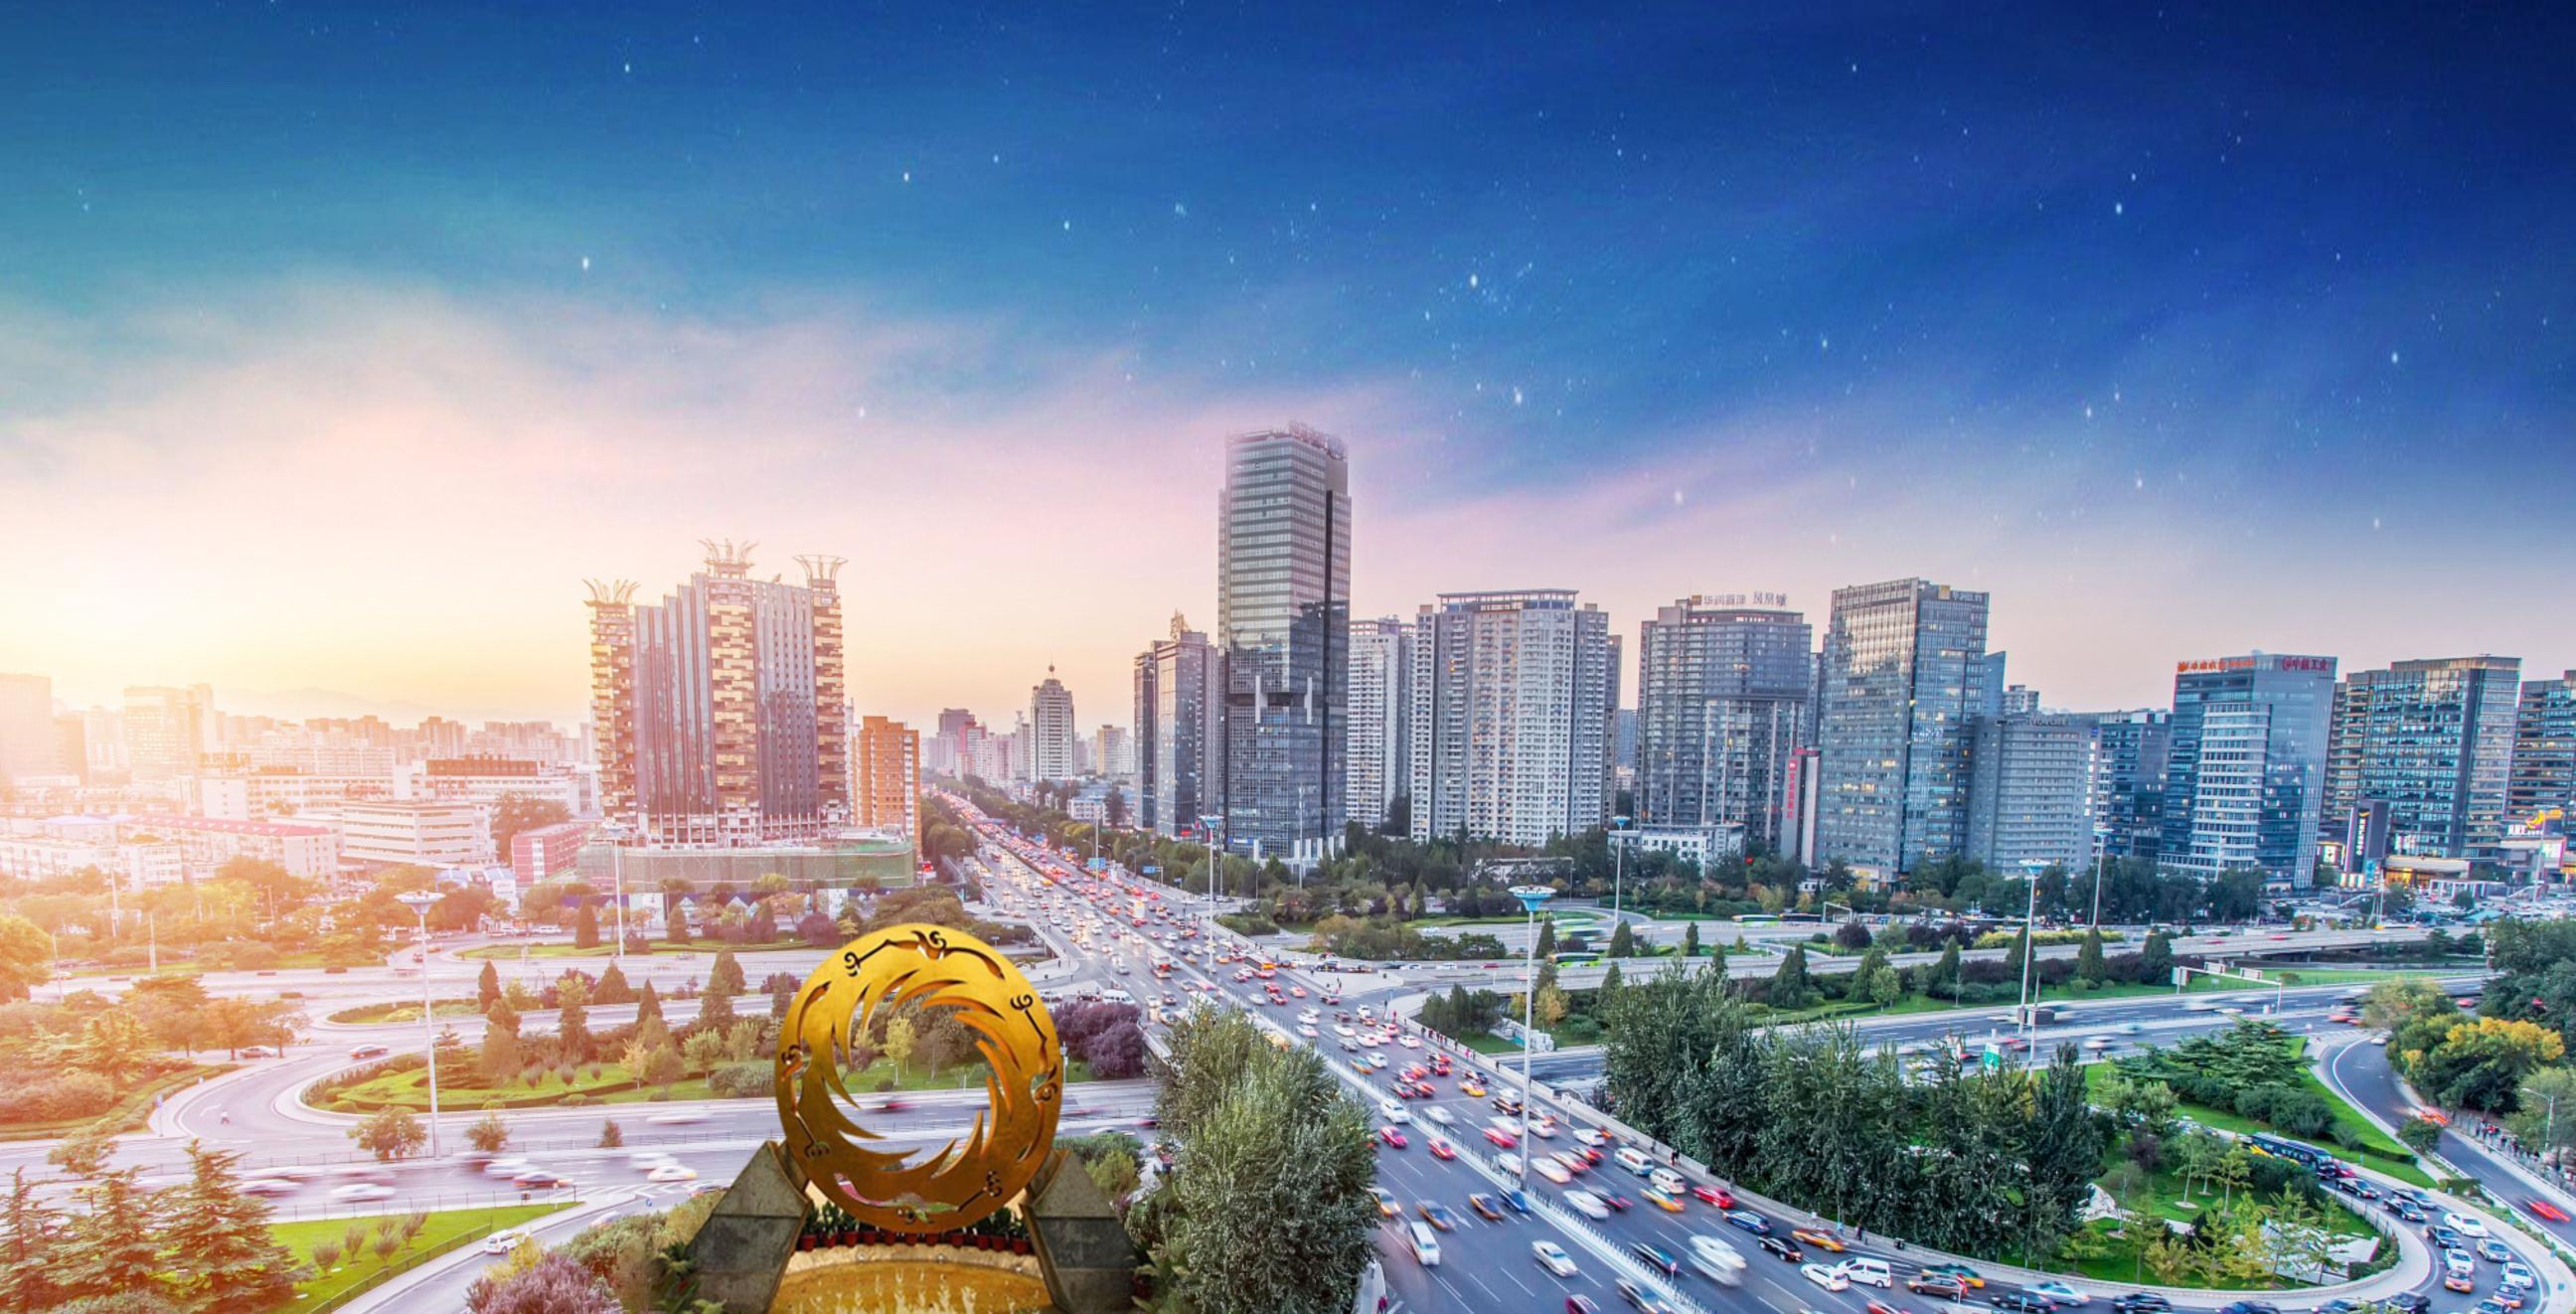 gdp十万亿_广东GDP首上十万亿,江苏还能逆袭吗(3)